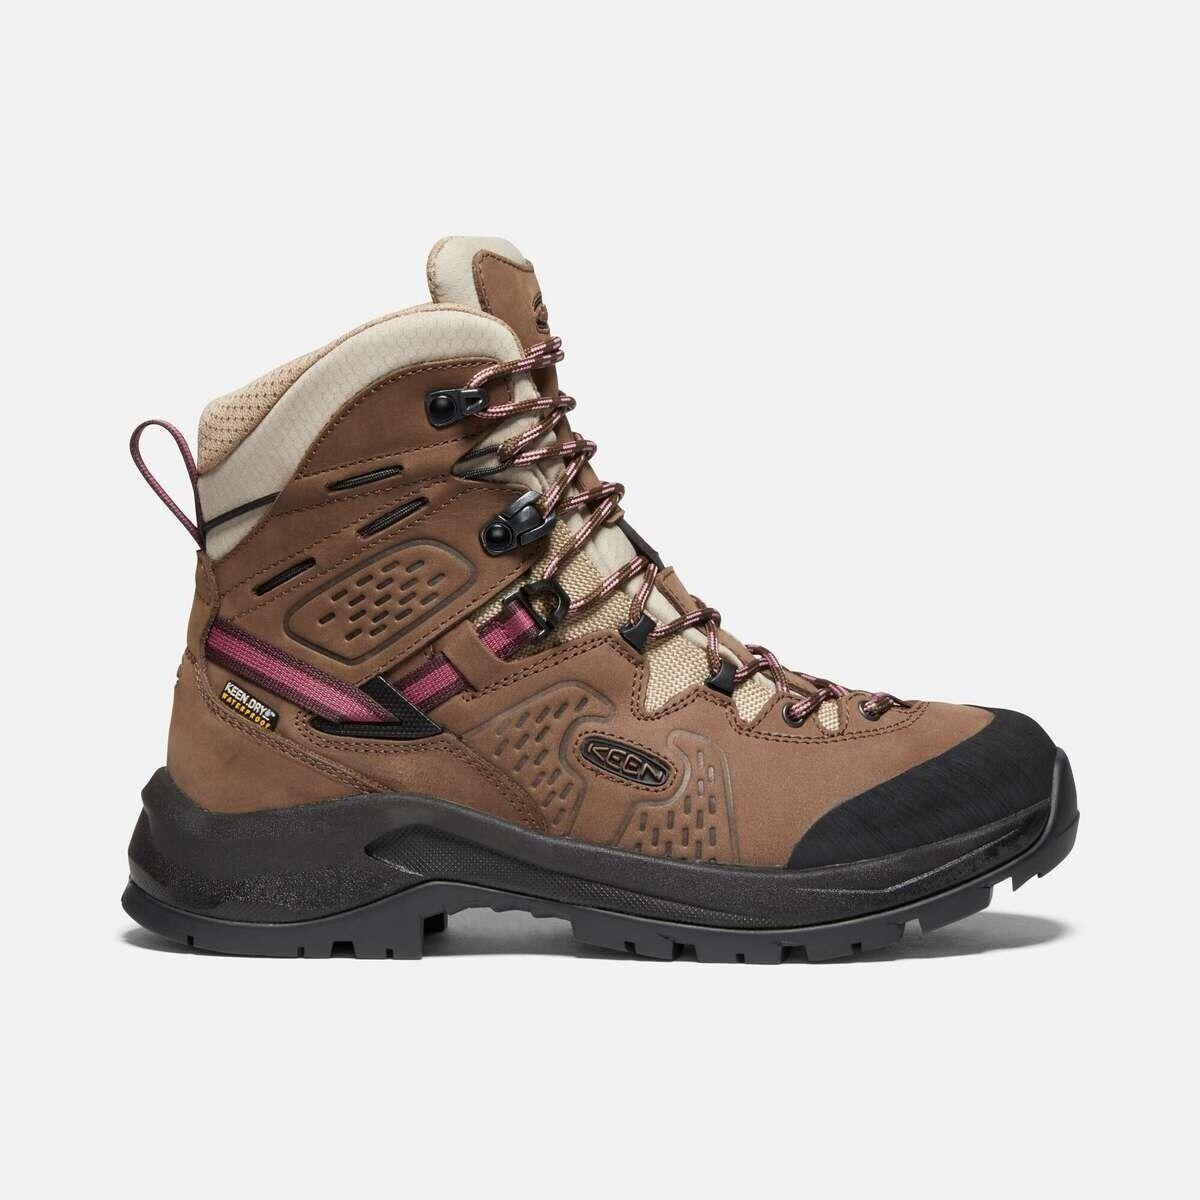 Keen Karraig Mid WP Hiking Boots Women